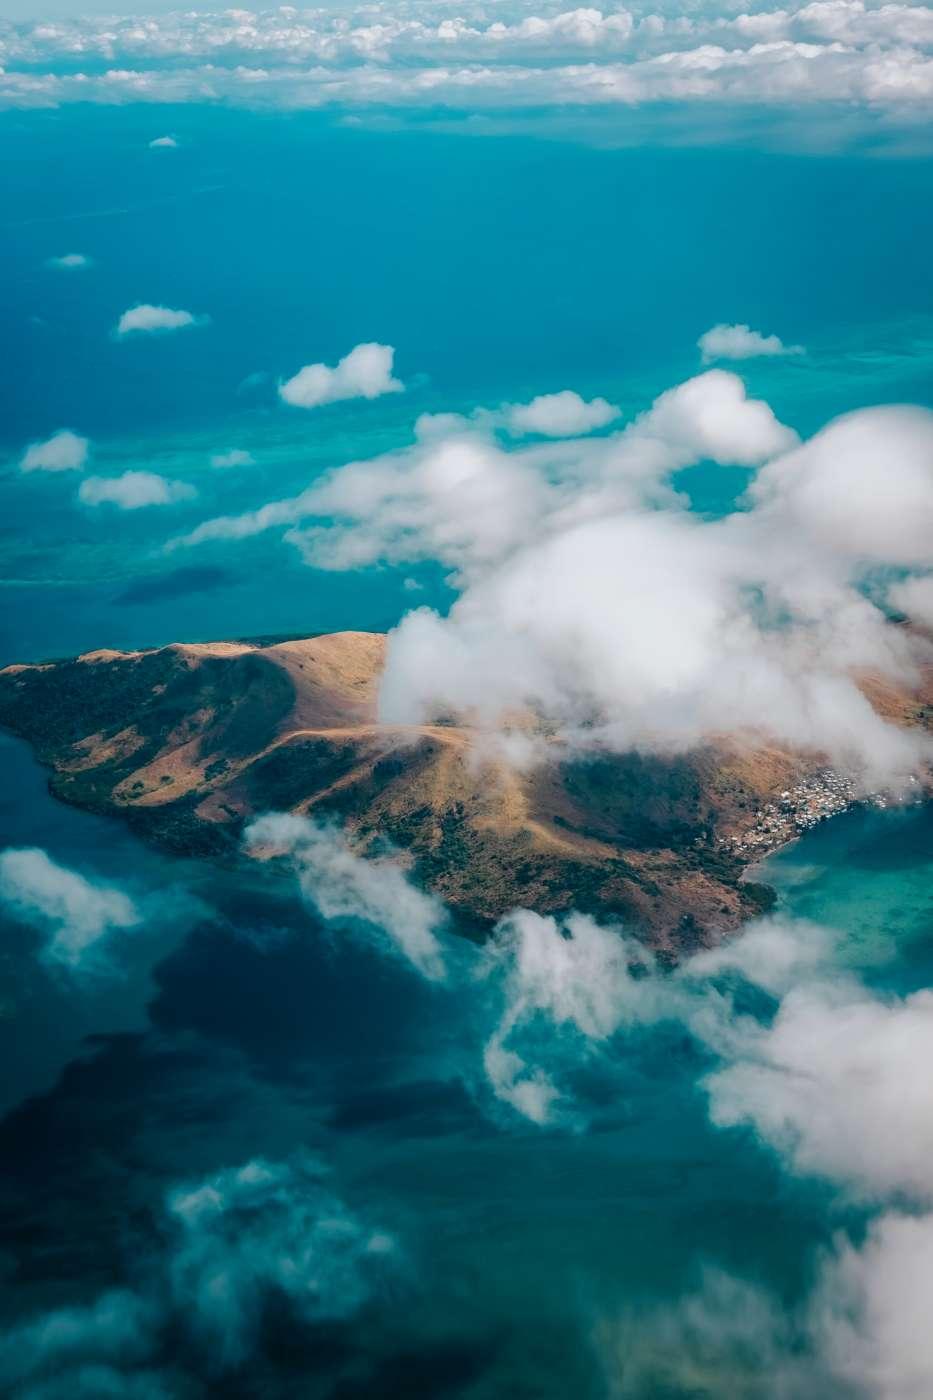 visa-free-countries-for-jamaicans-2020-fiji